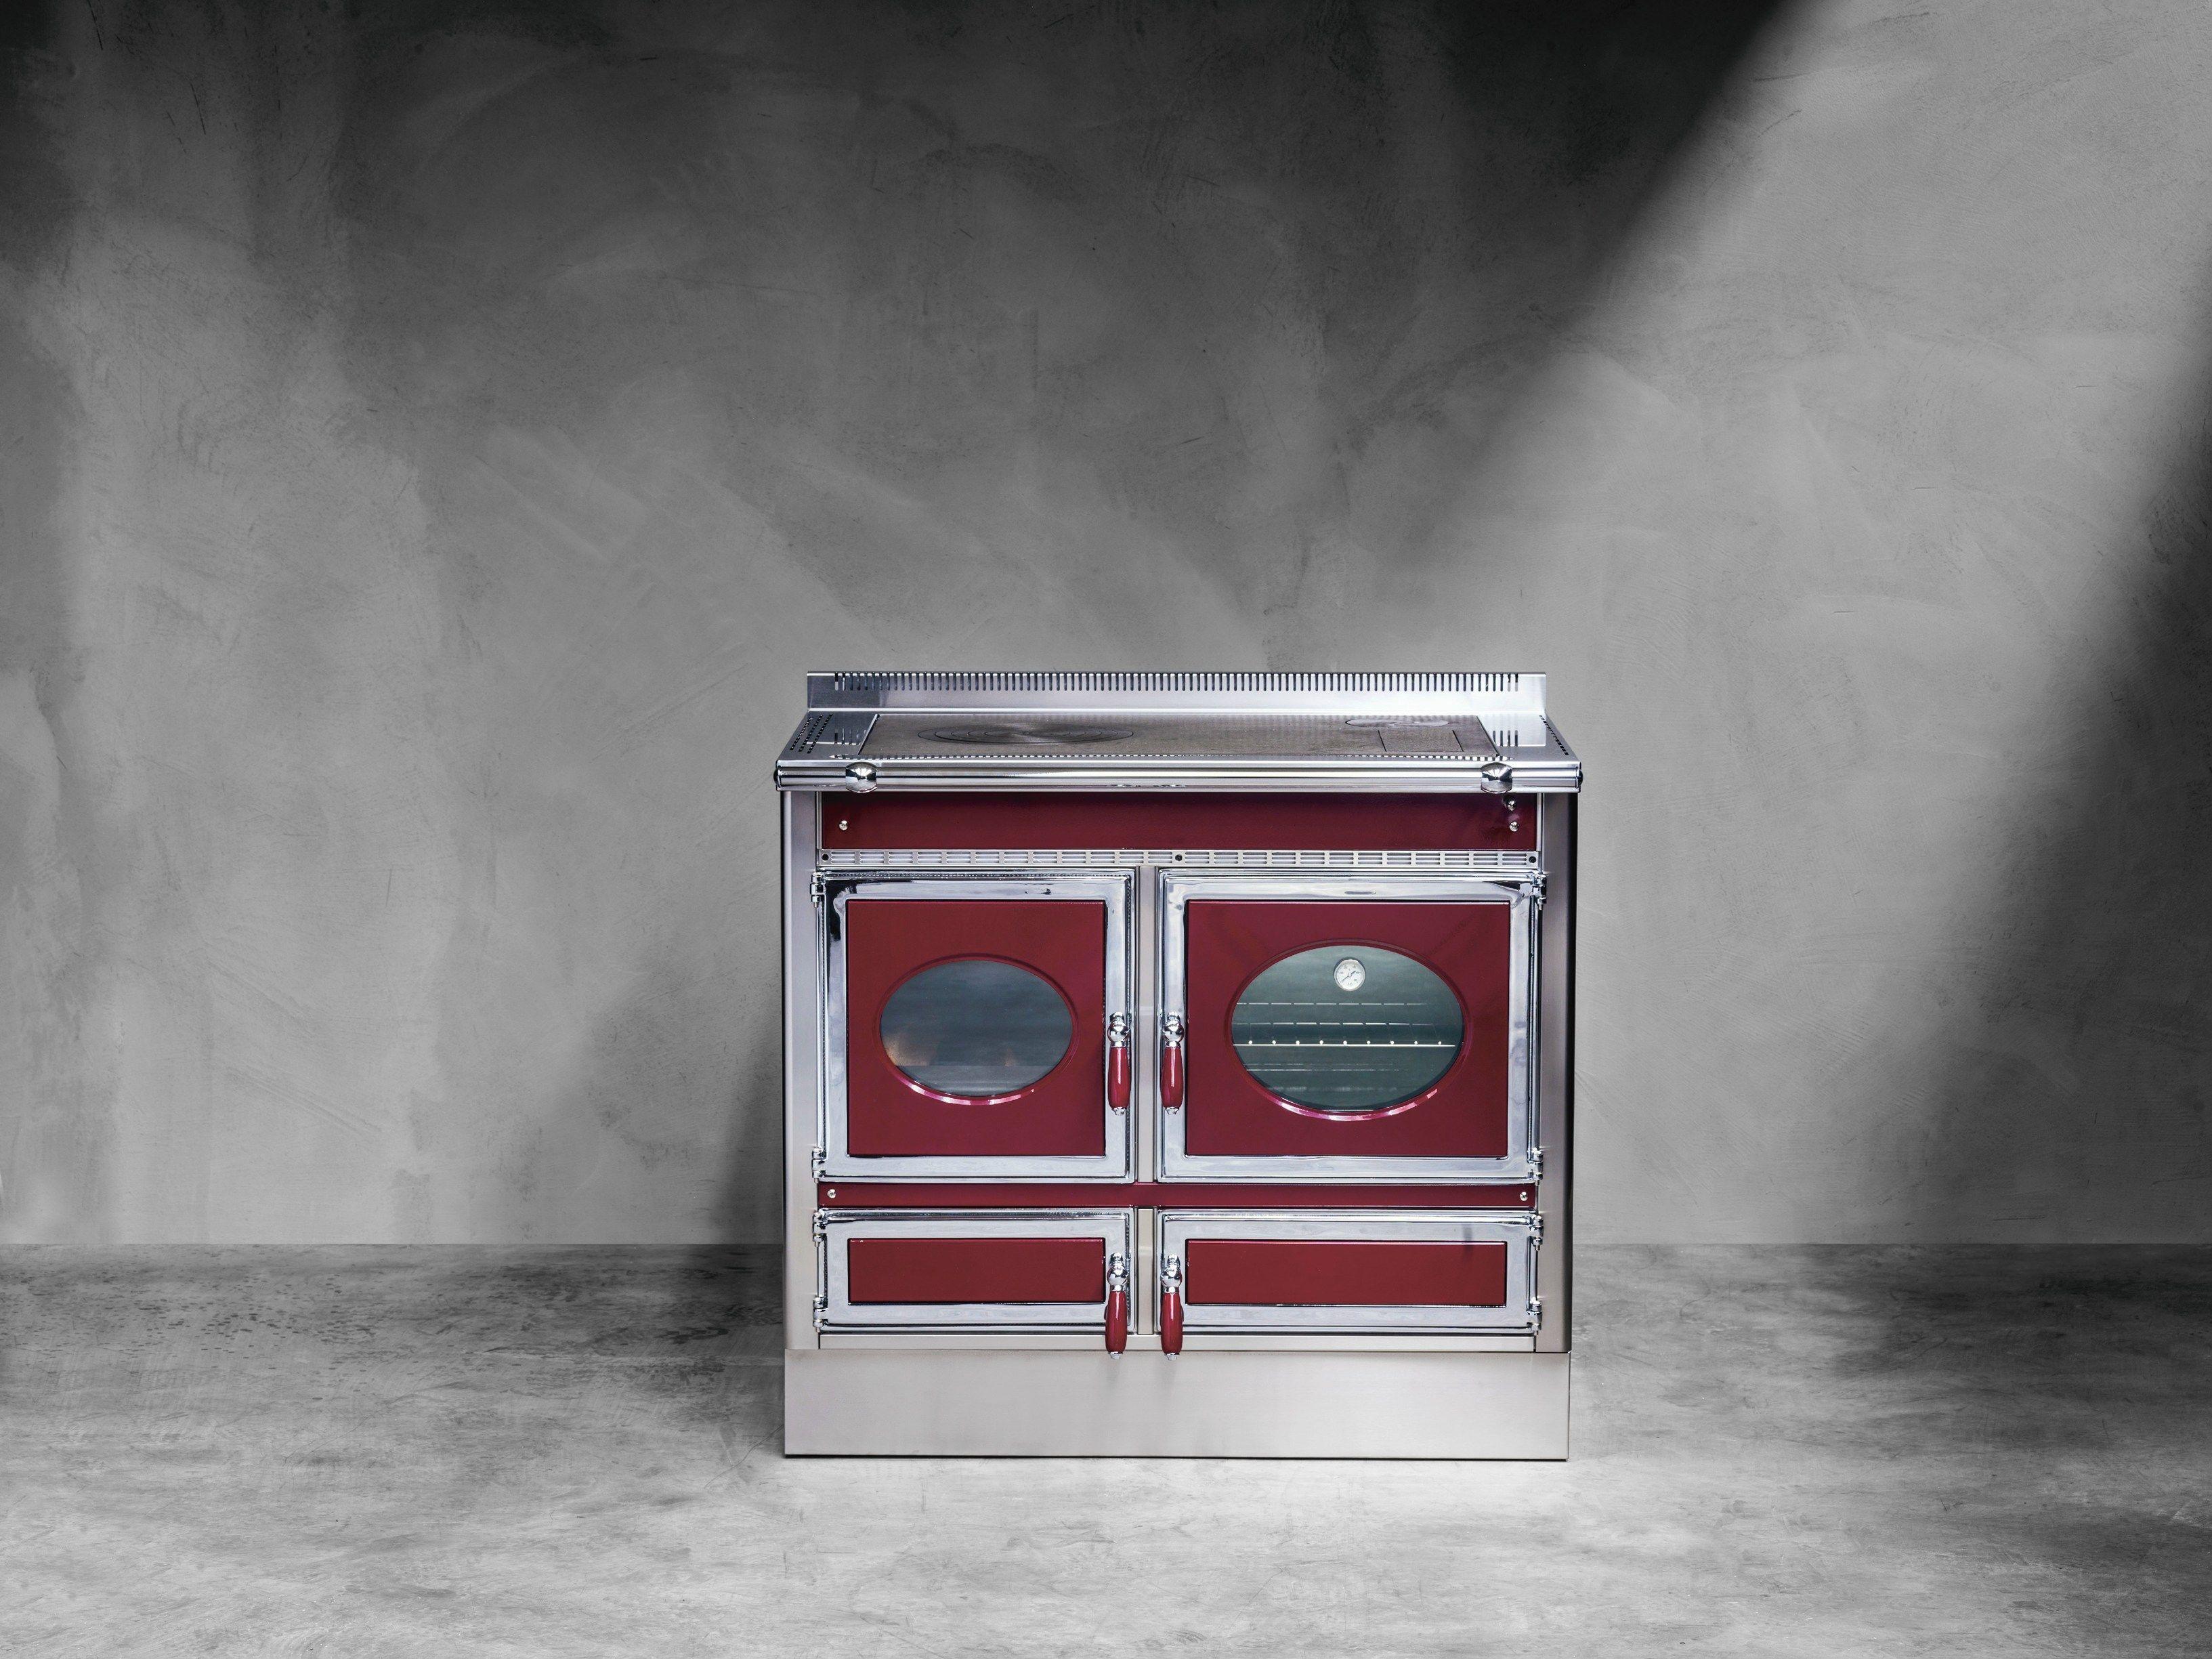 Panche Per Cucina Country: Cucina in legno country ? comprare ...